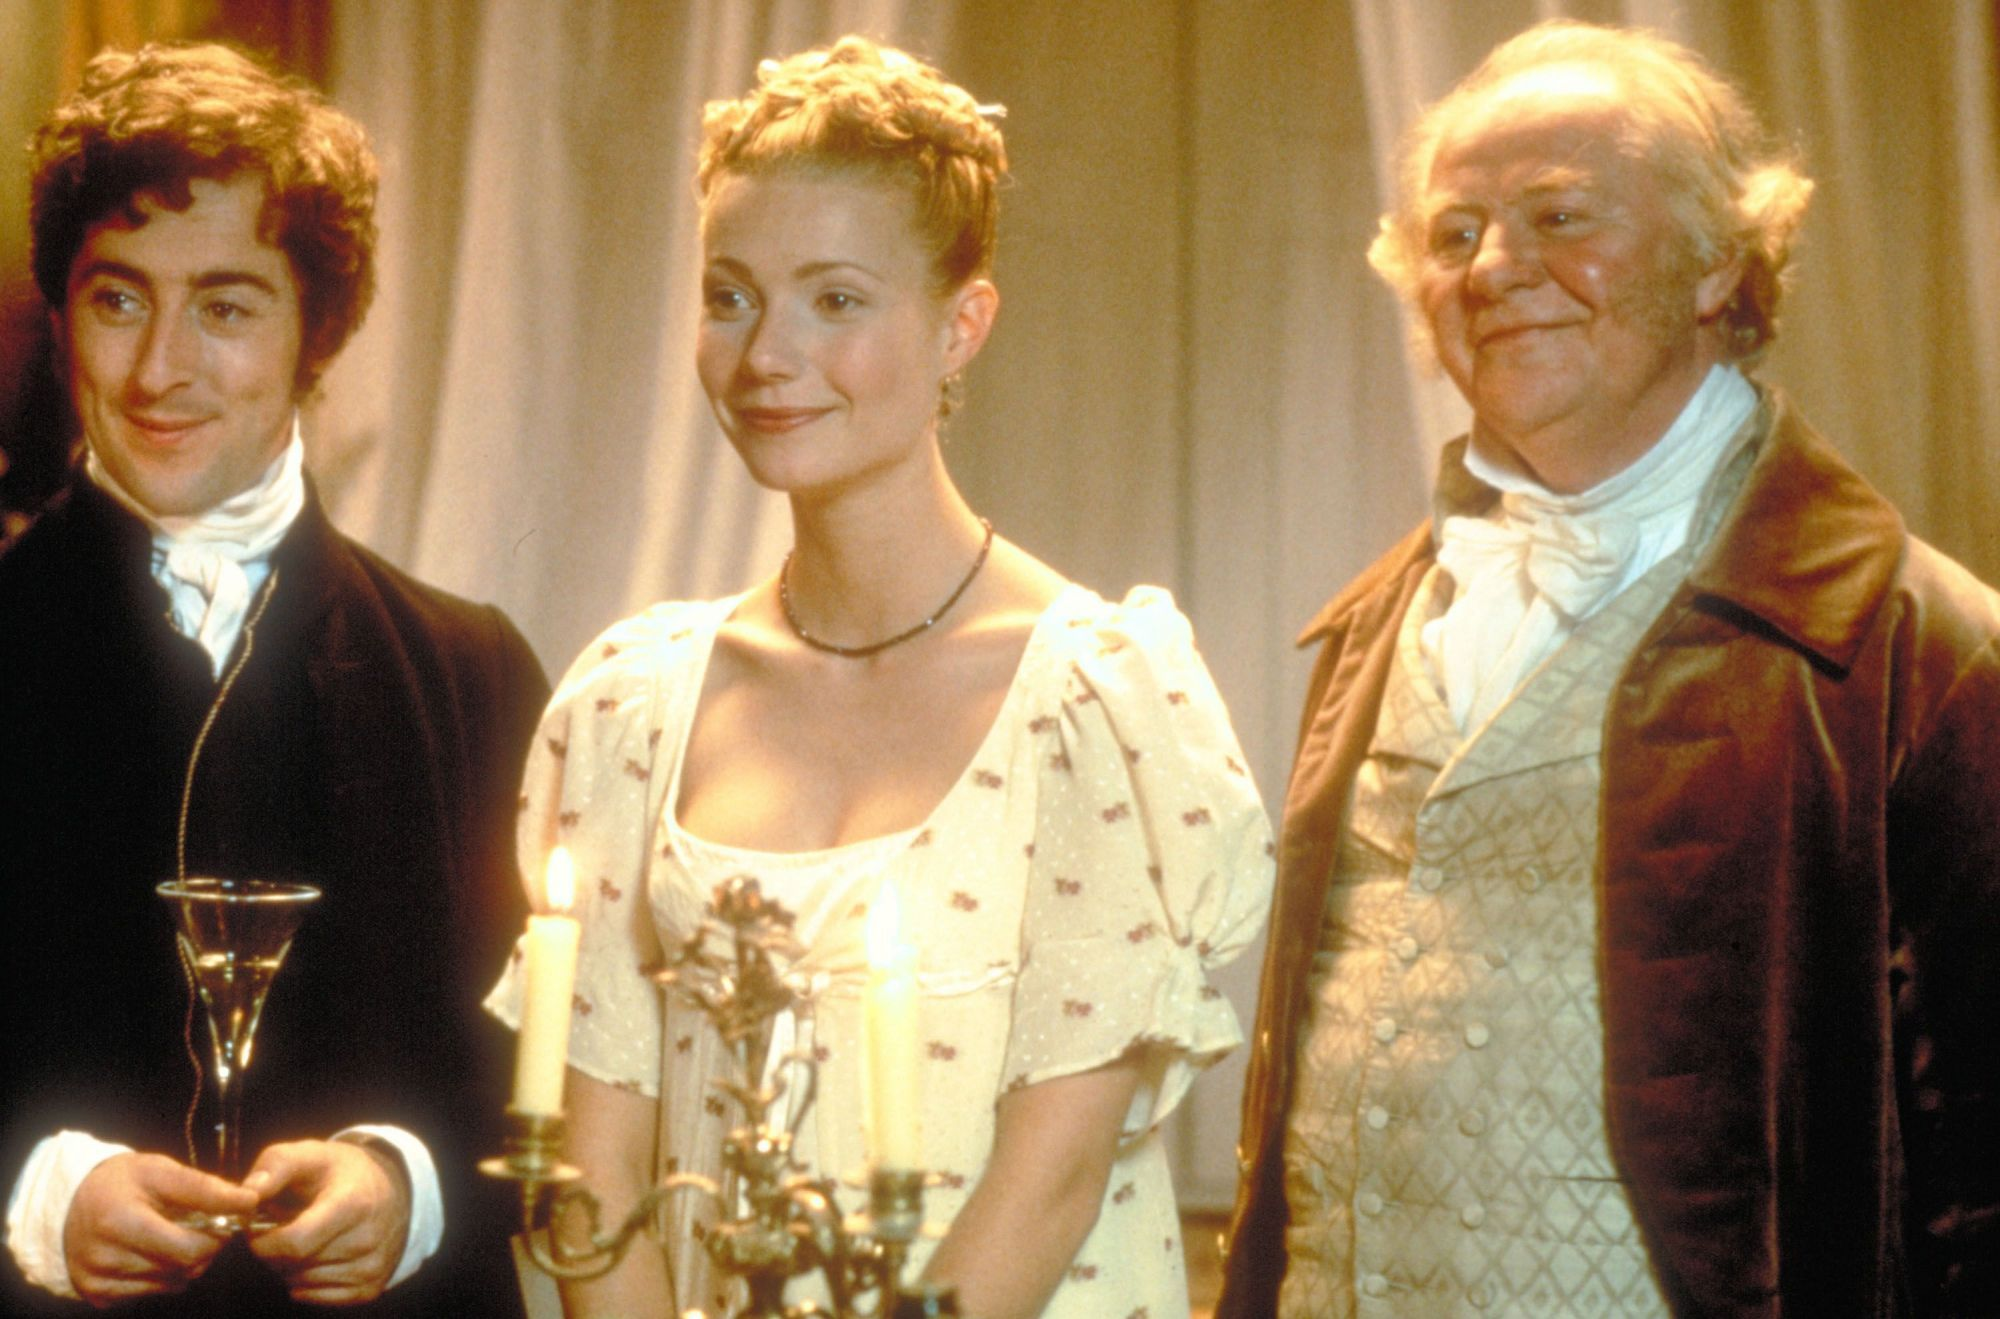 Emma 1996 - Emma Woodhouse and Mr Elton with Mr Woodhouse